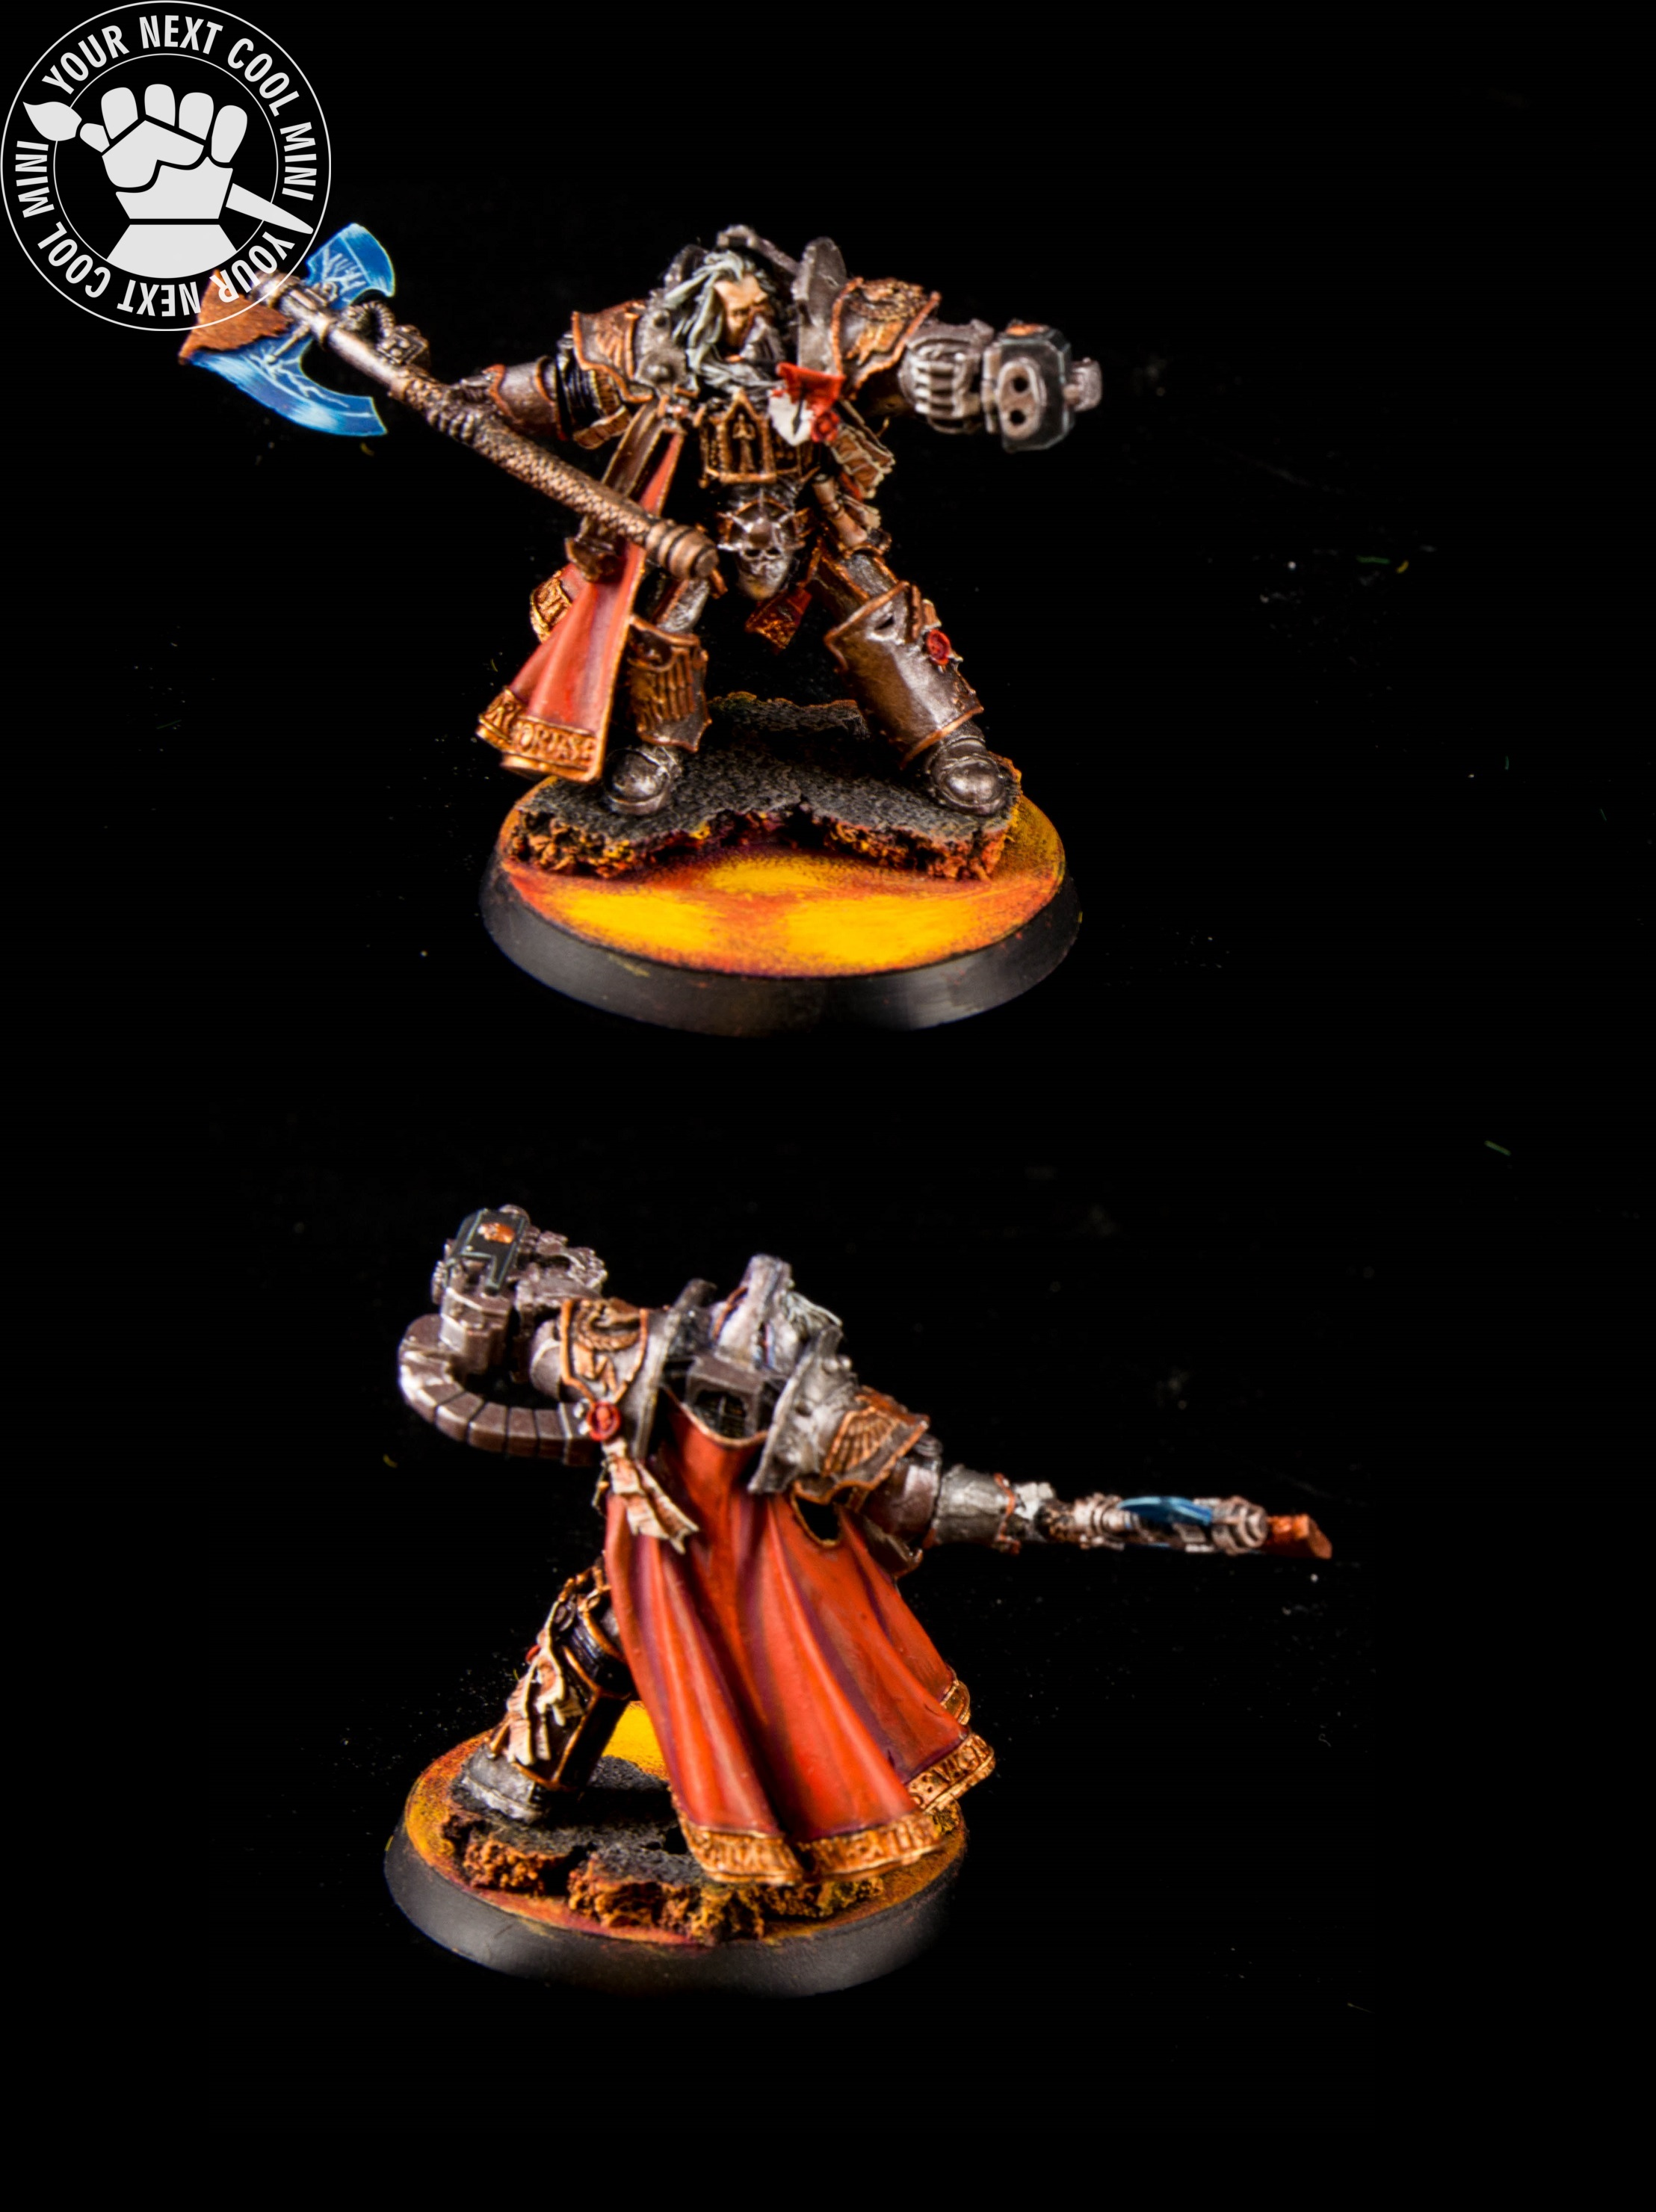 Warhammer 40k, Grey Knight, Grand master in terminator armor